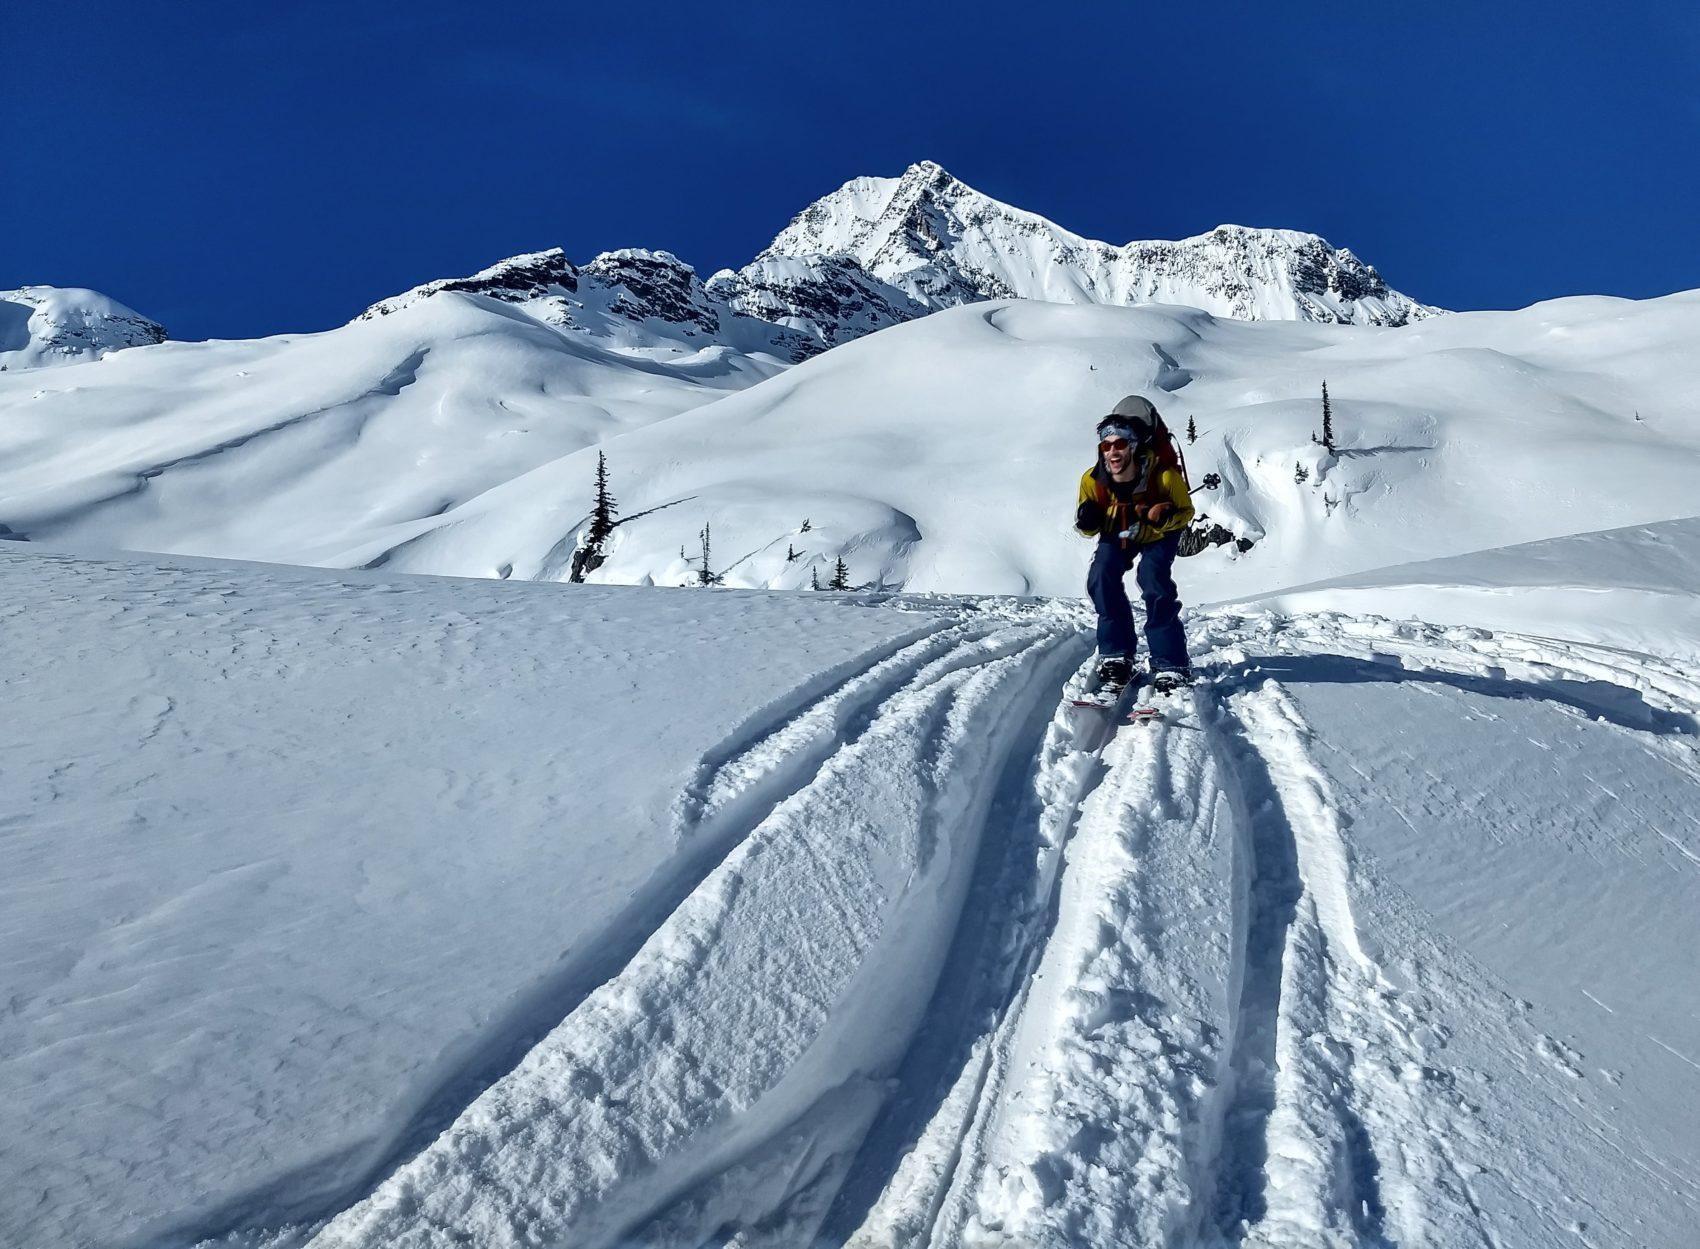 splitboarder giving skiing a go